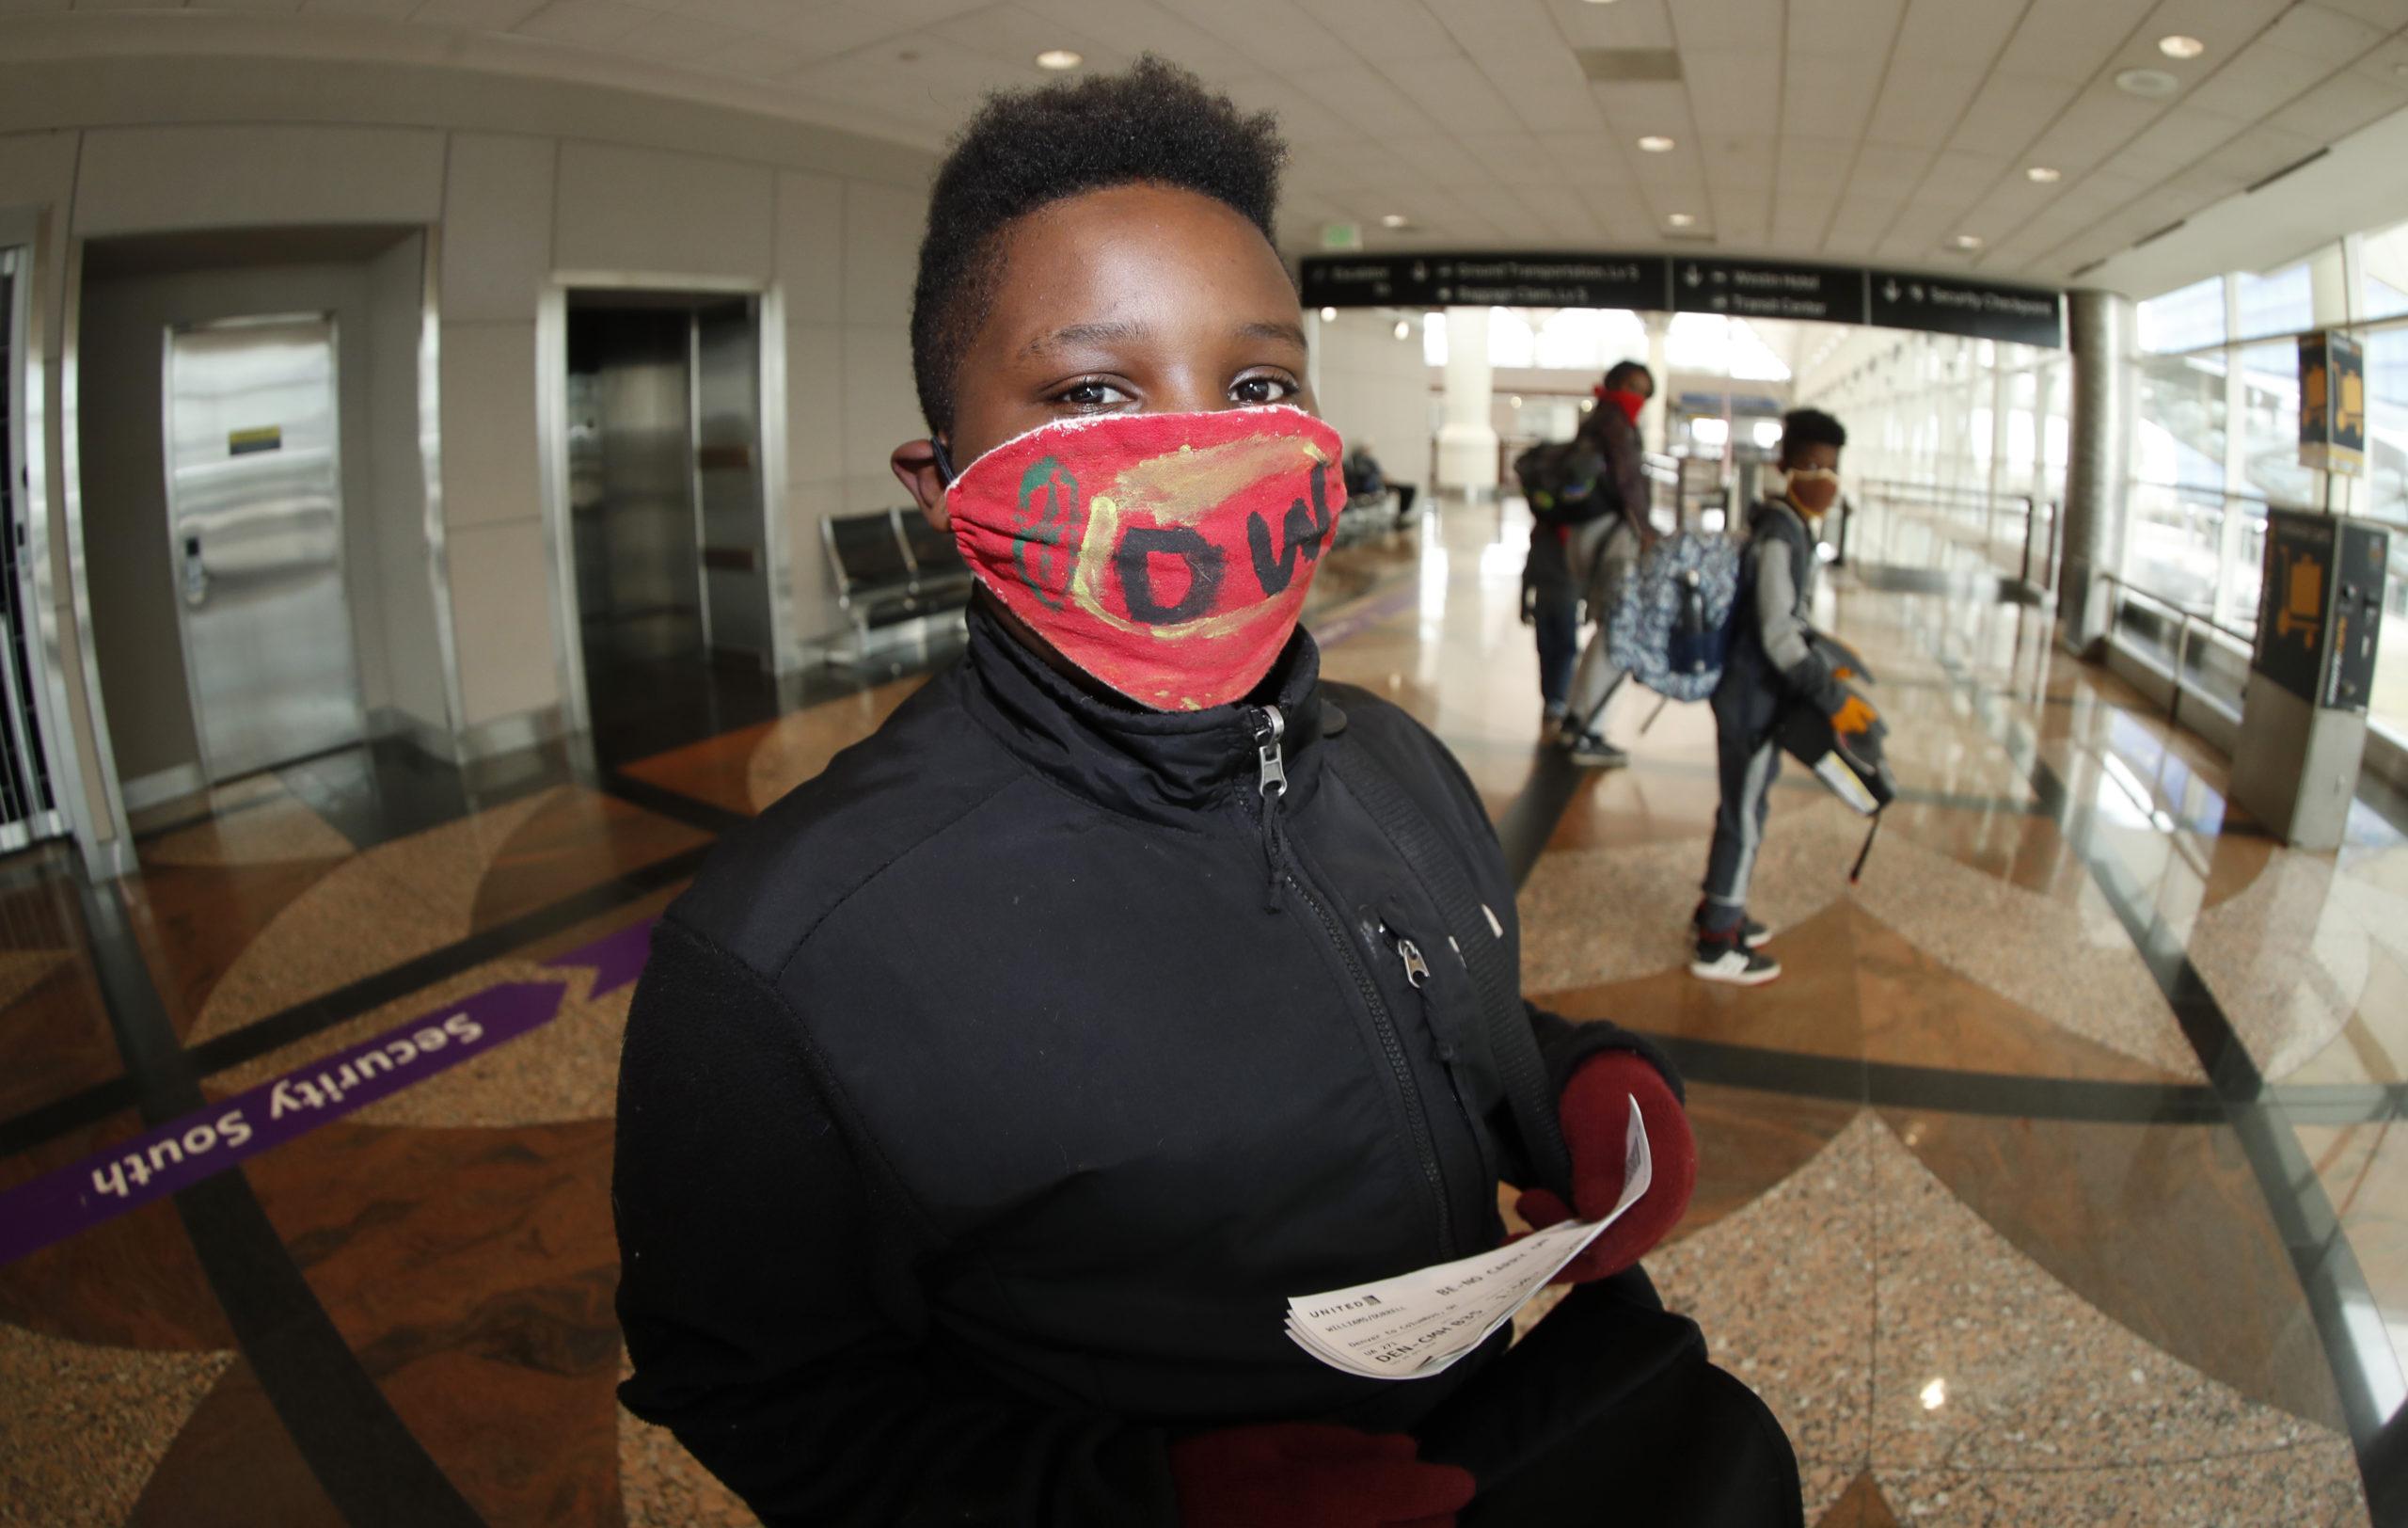 denver international airport face mask travelling kid, r m